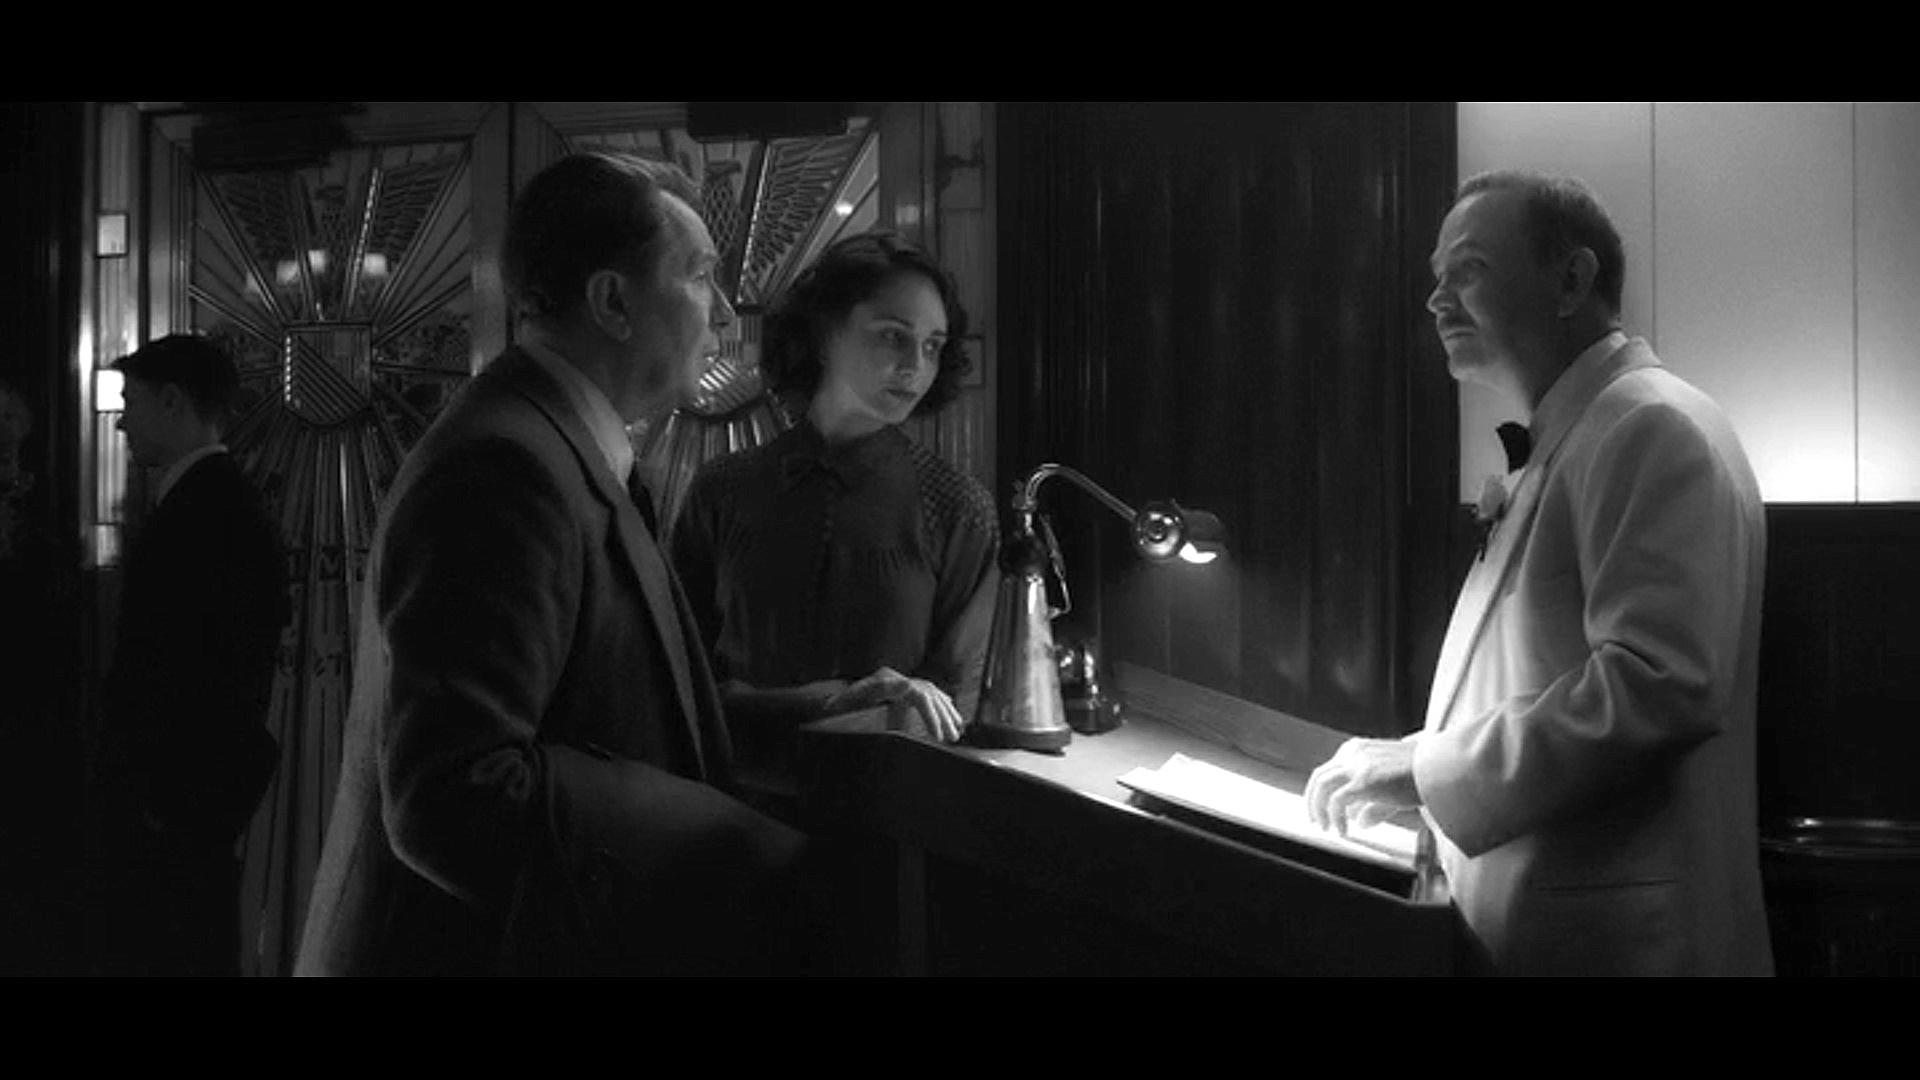 Gary Oldman, Gabriela Rae, Randy Davison, and Tuppence Middleton in Mank (2020)